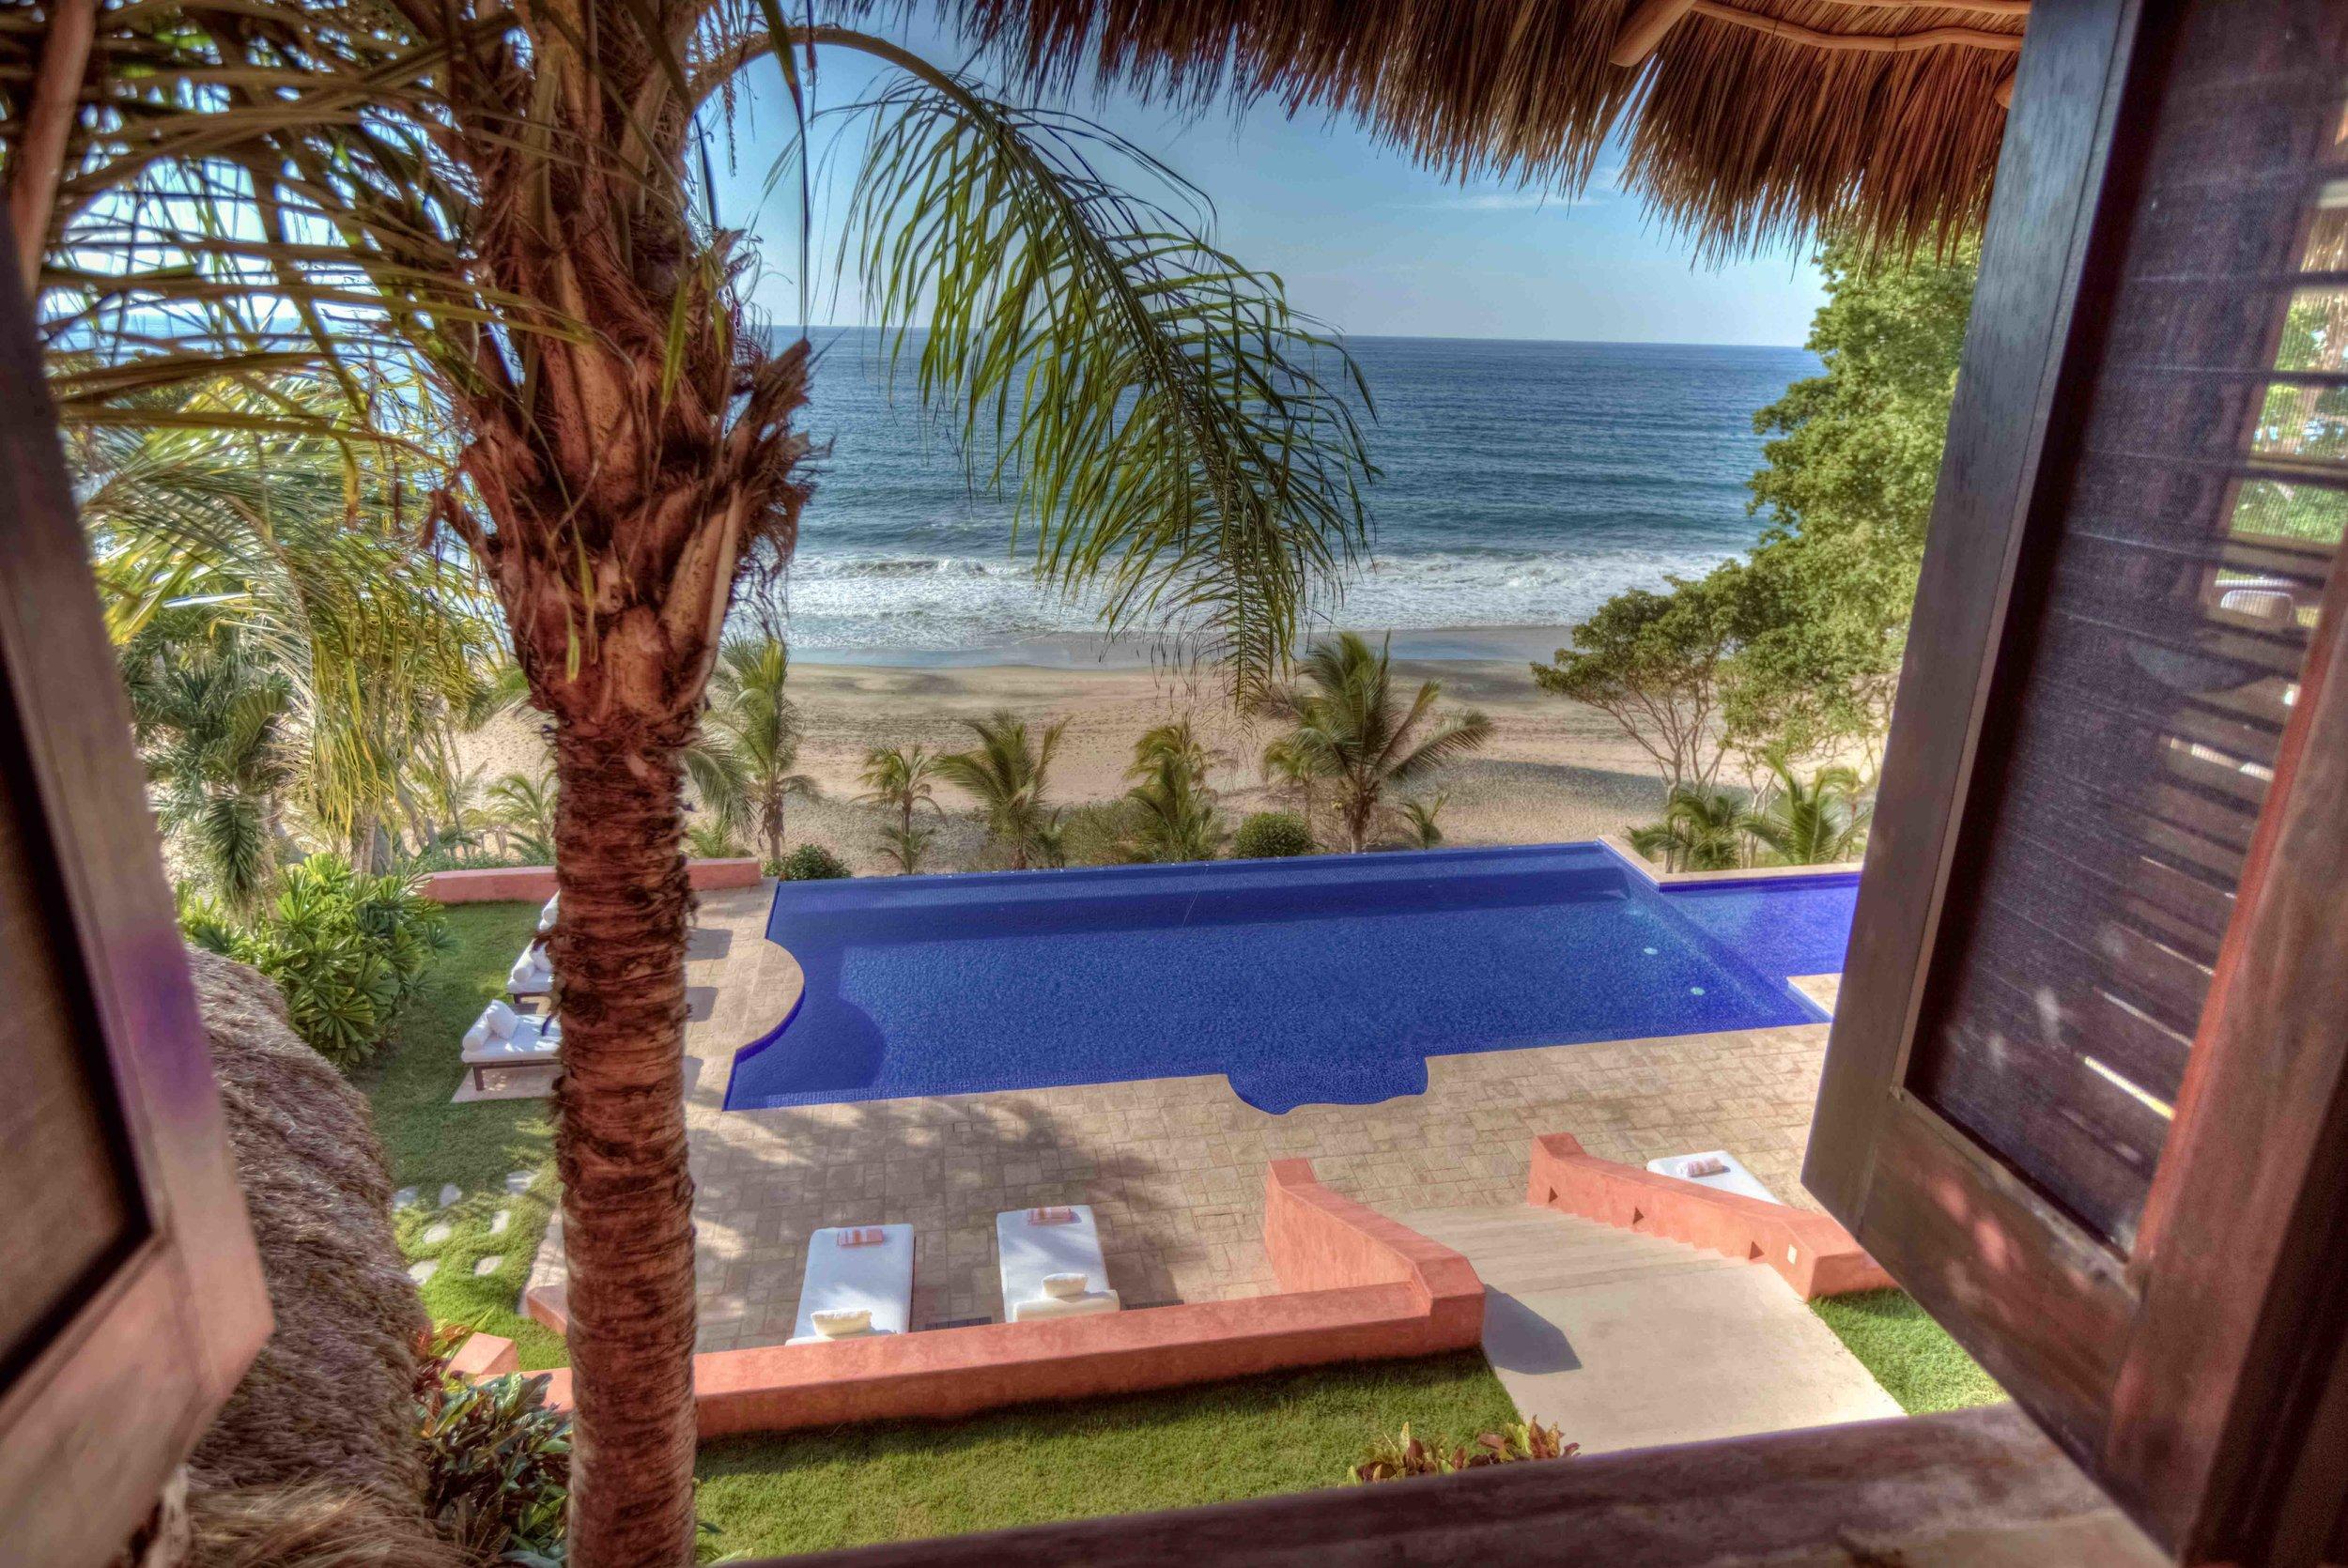 Luxury-Villa-Rental-Mexico-19.jpg